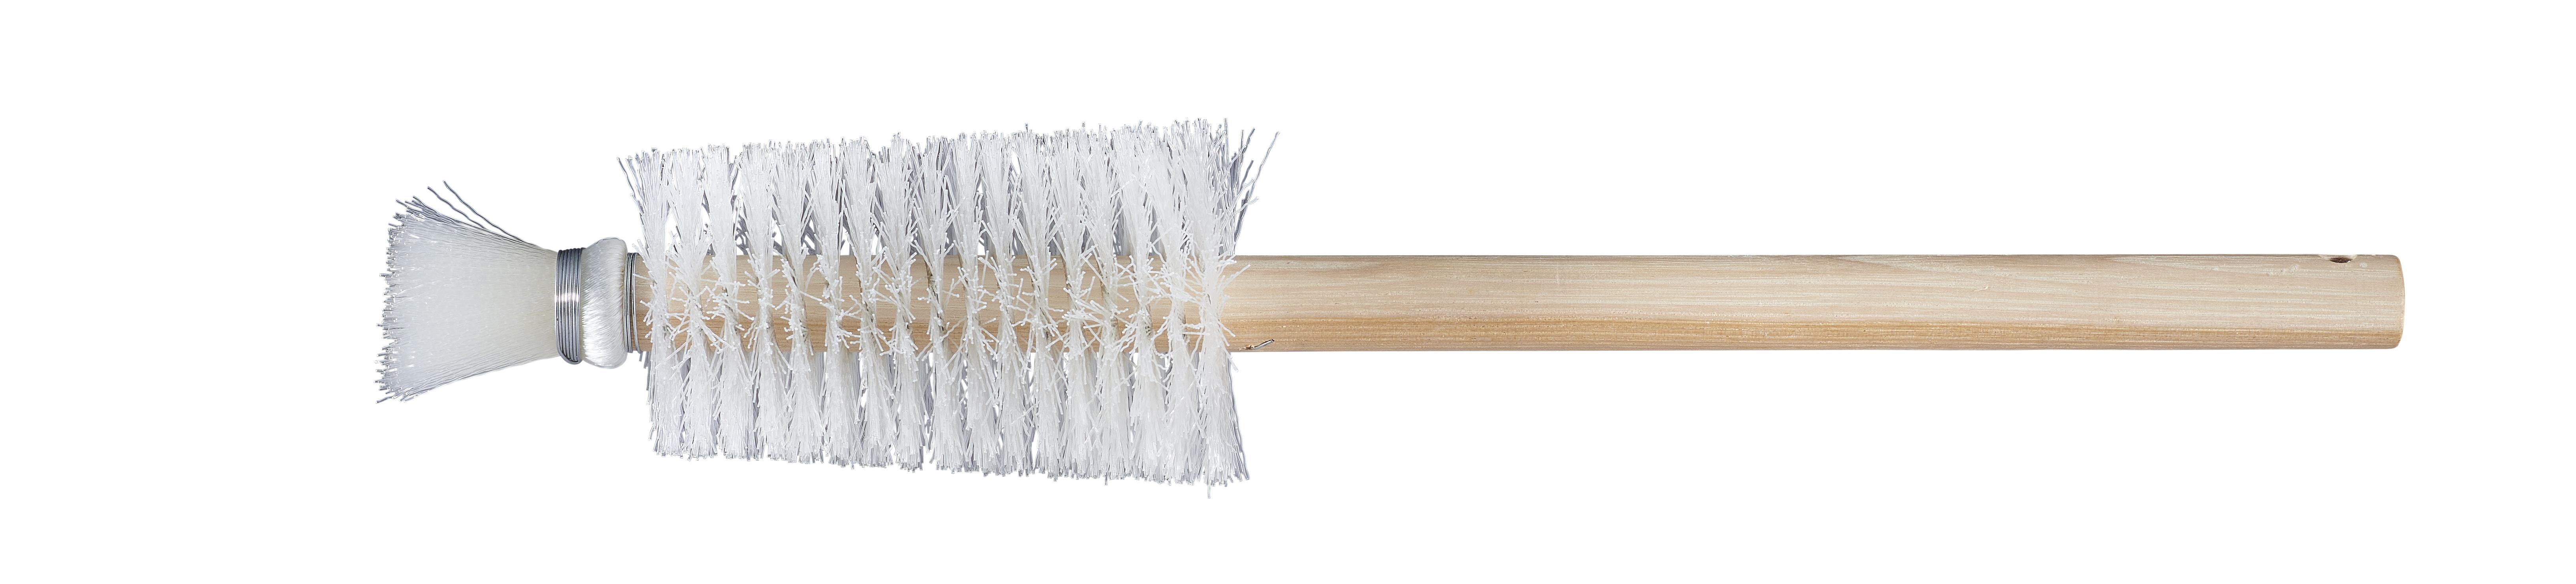 06183 Beaker Brush